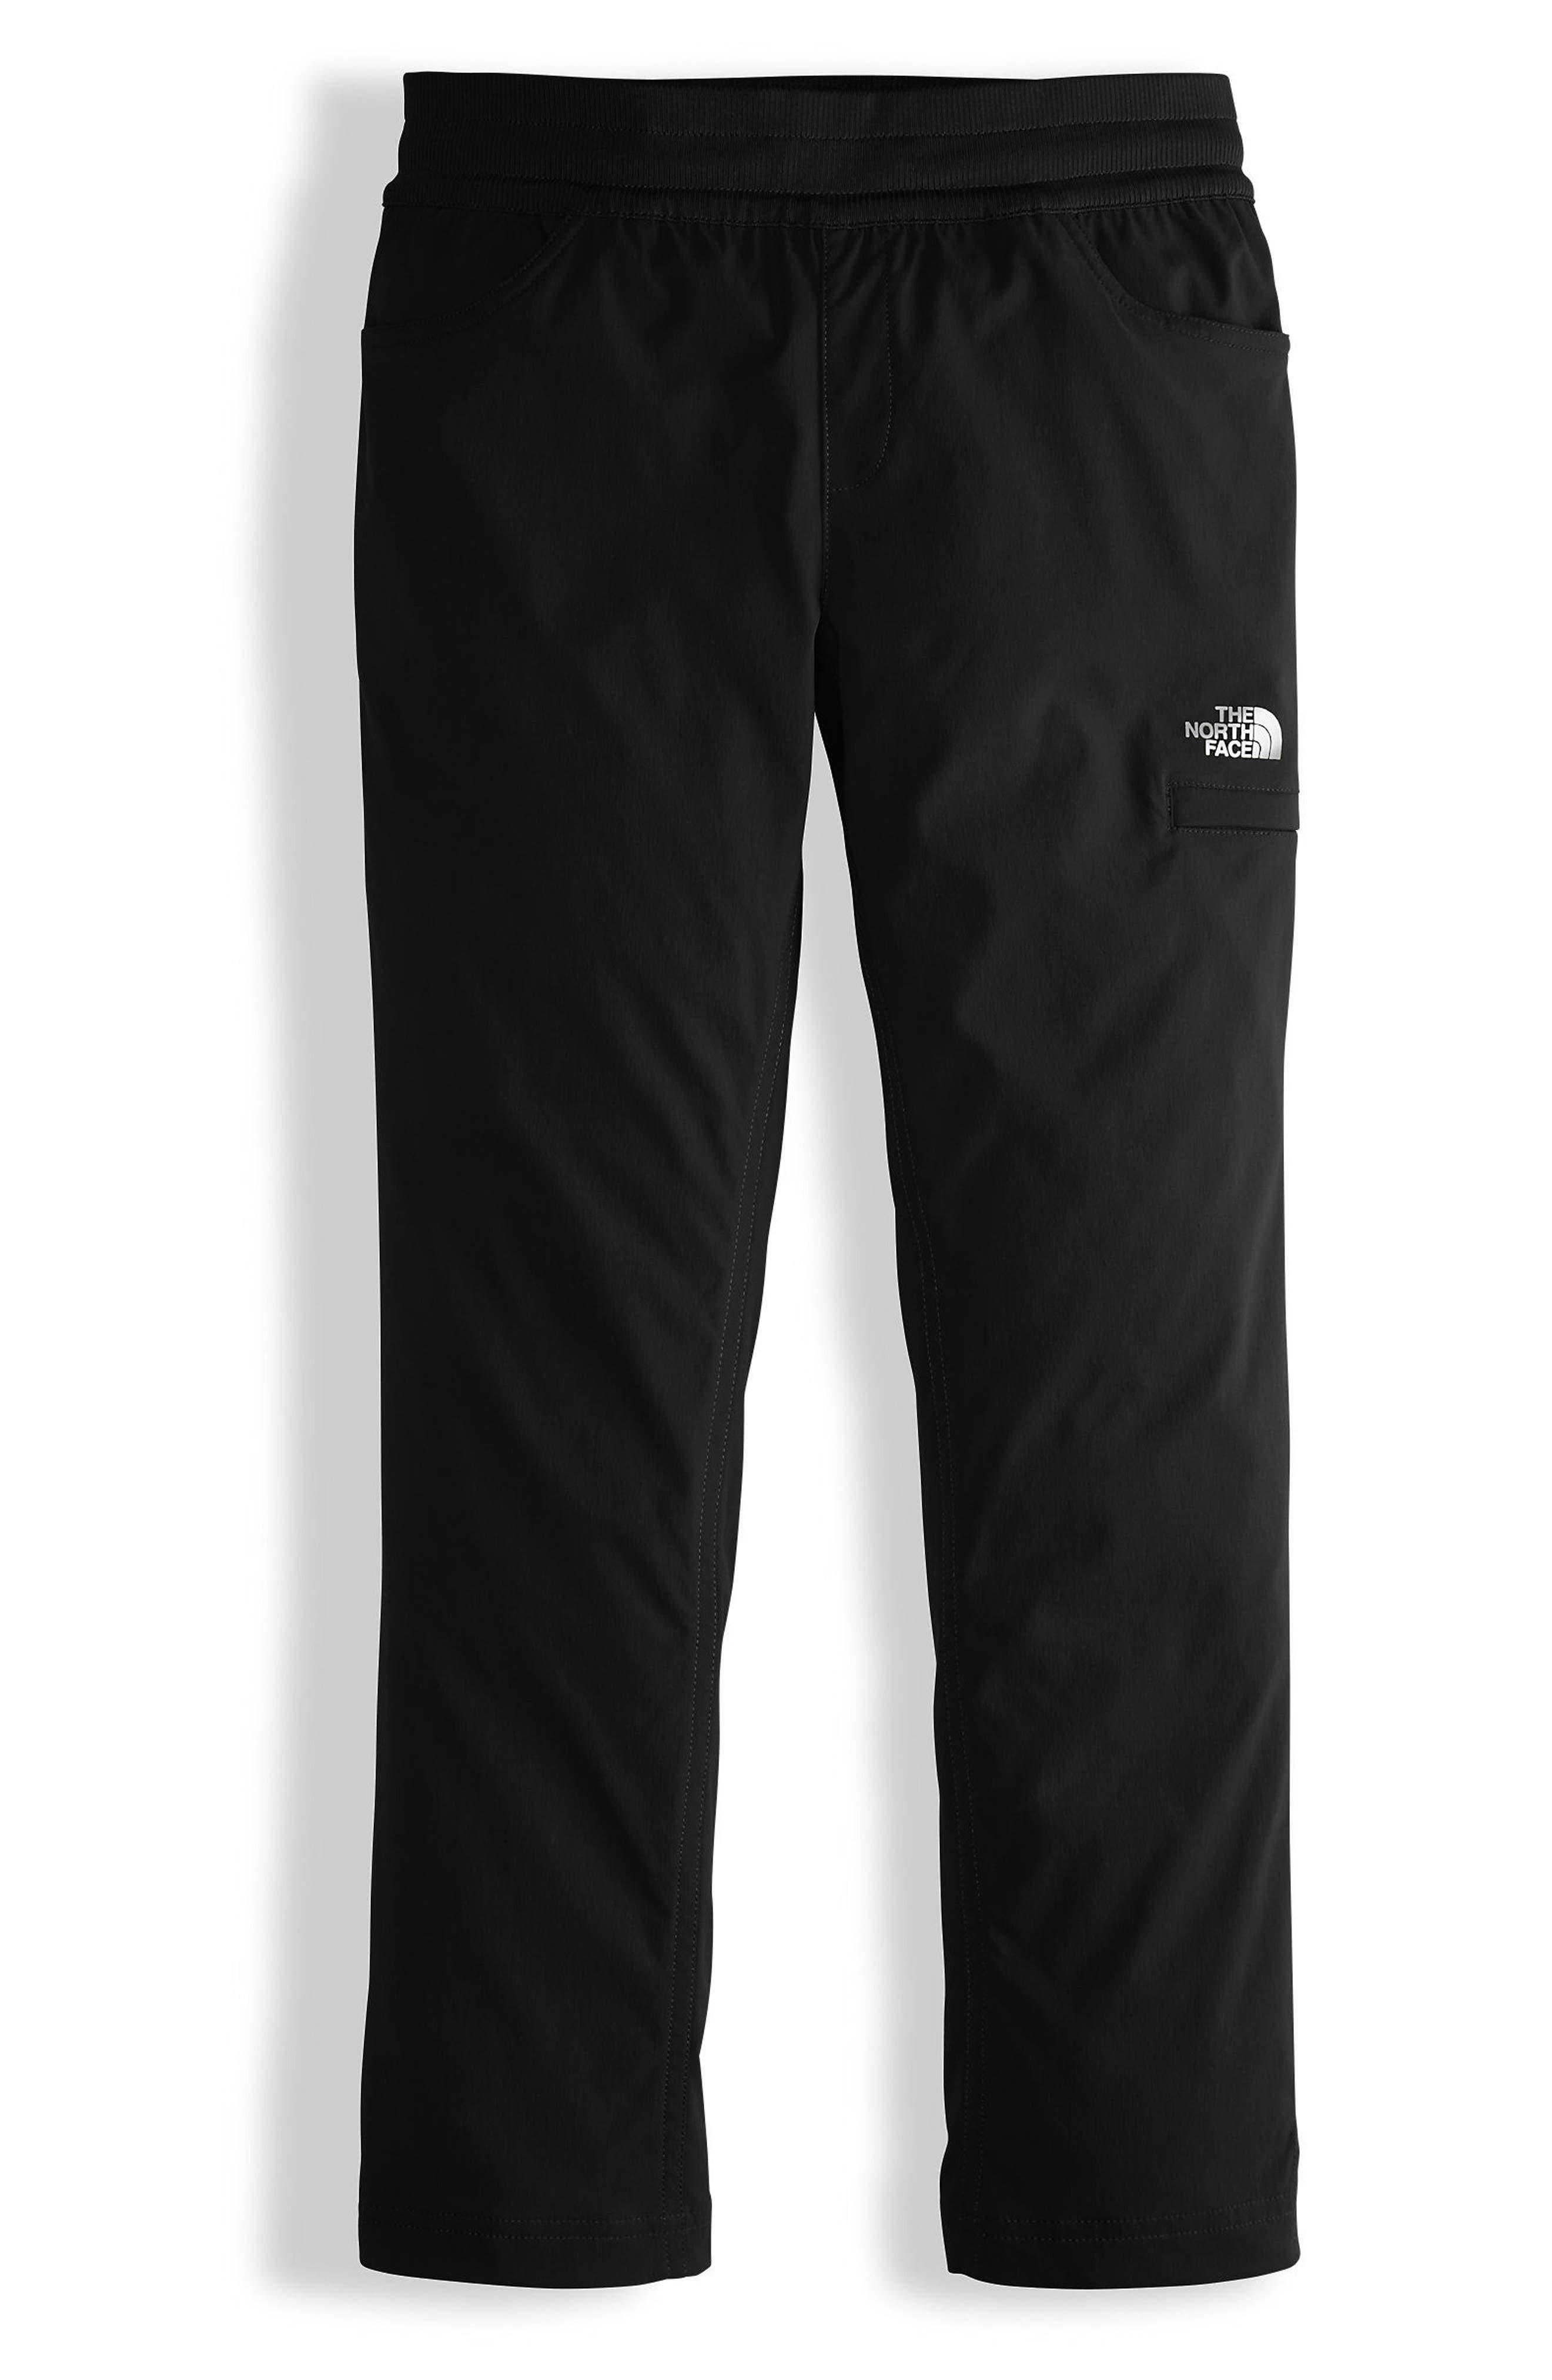 Aphrodite HD Luxe Pants,                             Main thumbnail 1, color,                             Tnf Black